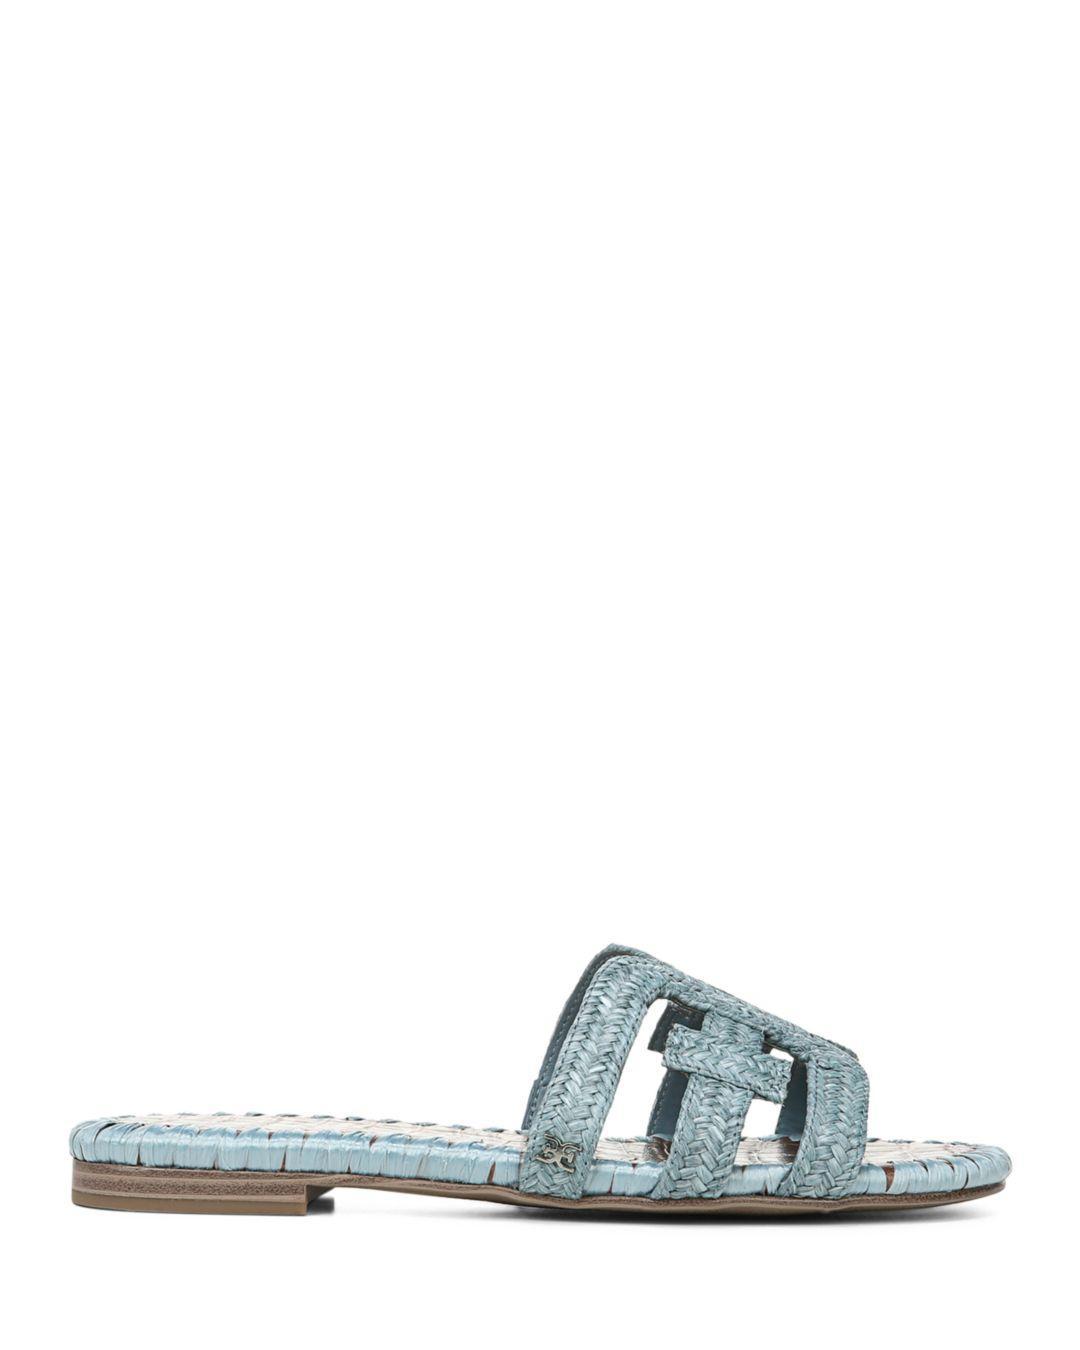 c8ff3fc5b Sam Edelman Women s Beckie Woven Slide Sandals in Blue - Lyst